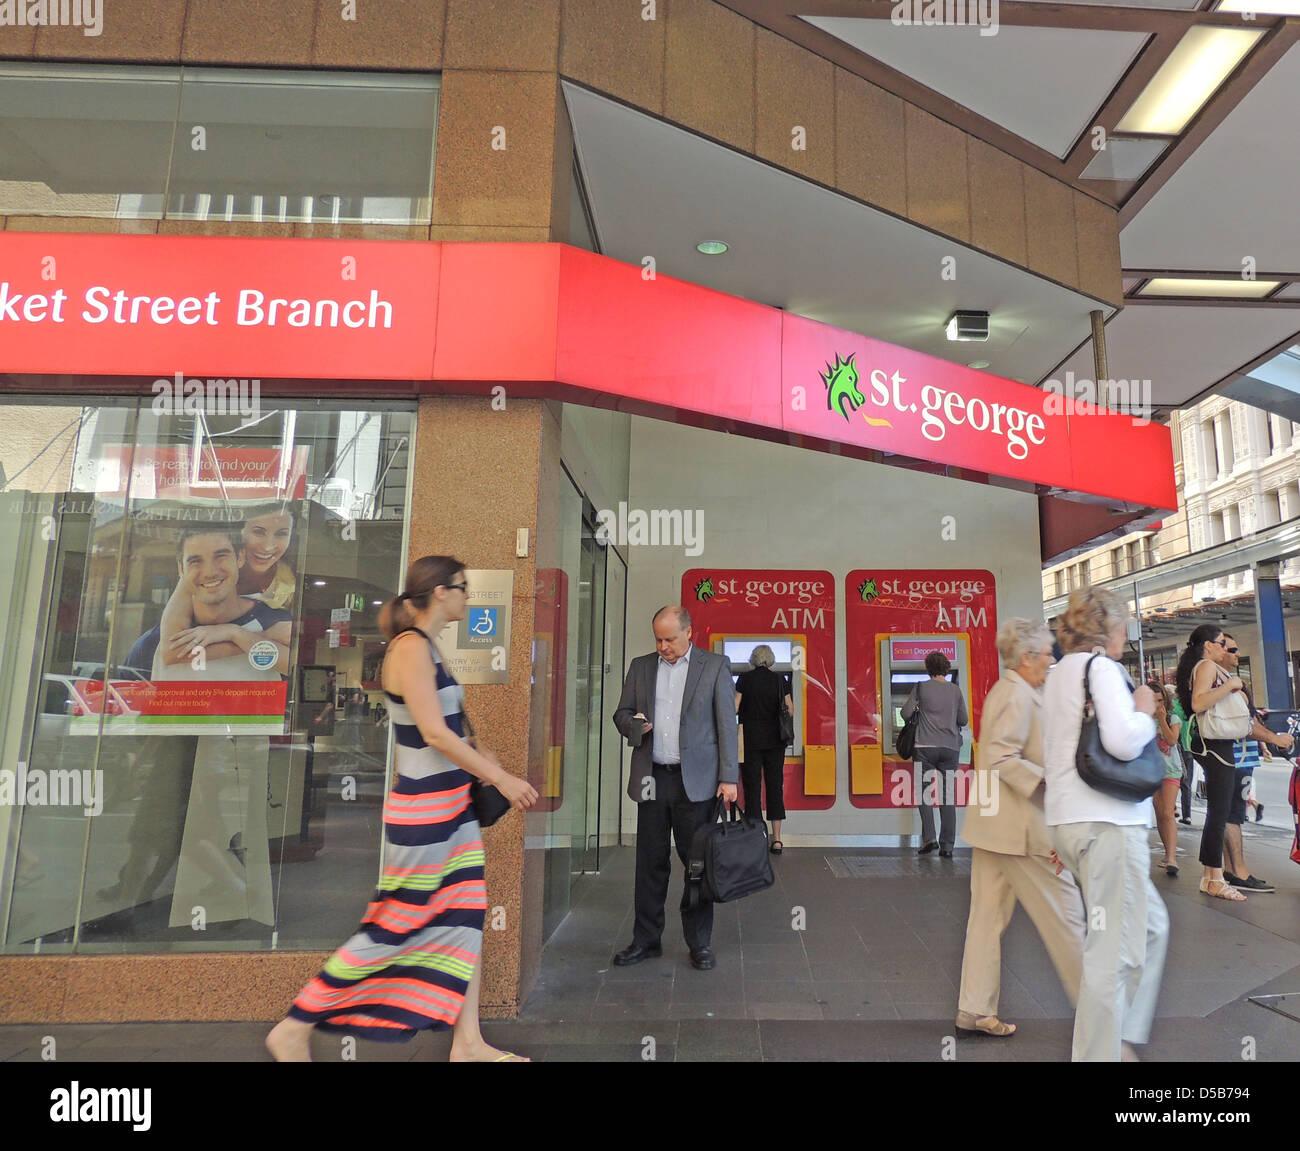 ST, GEORGE BANK branch in Sydney, Australia. Photo Tony Gale - Stock Image